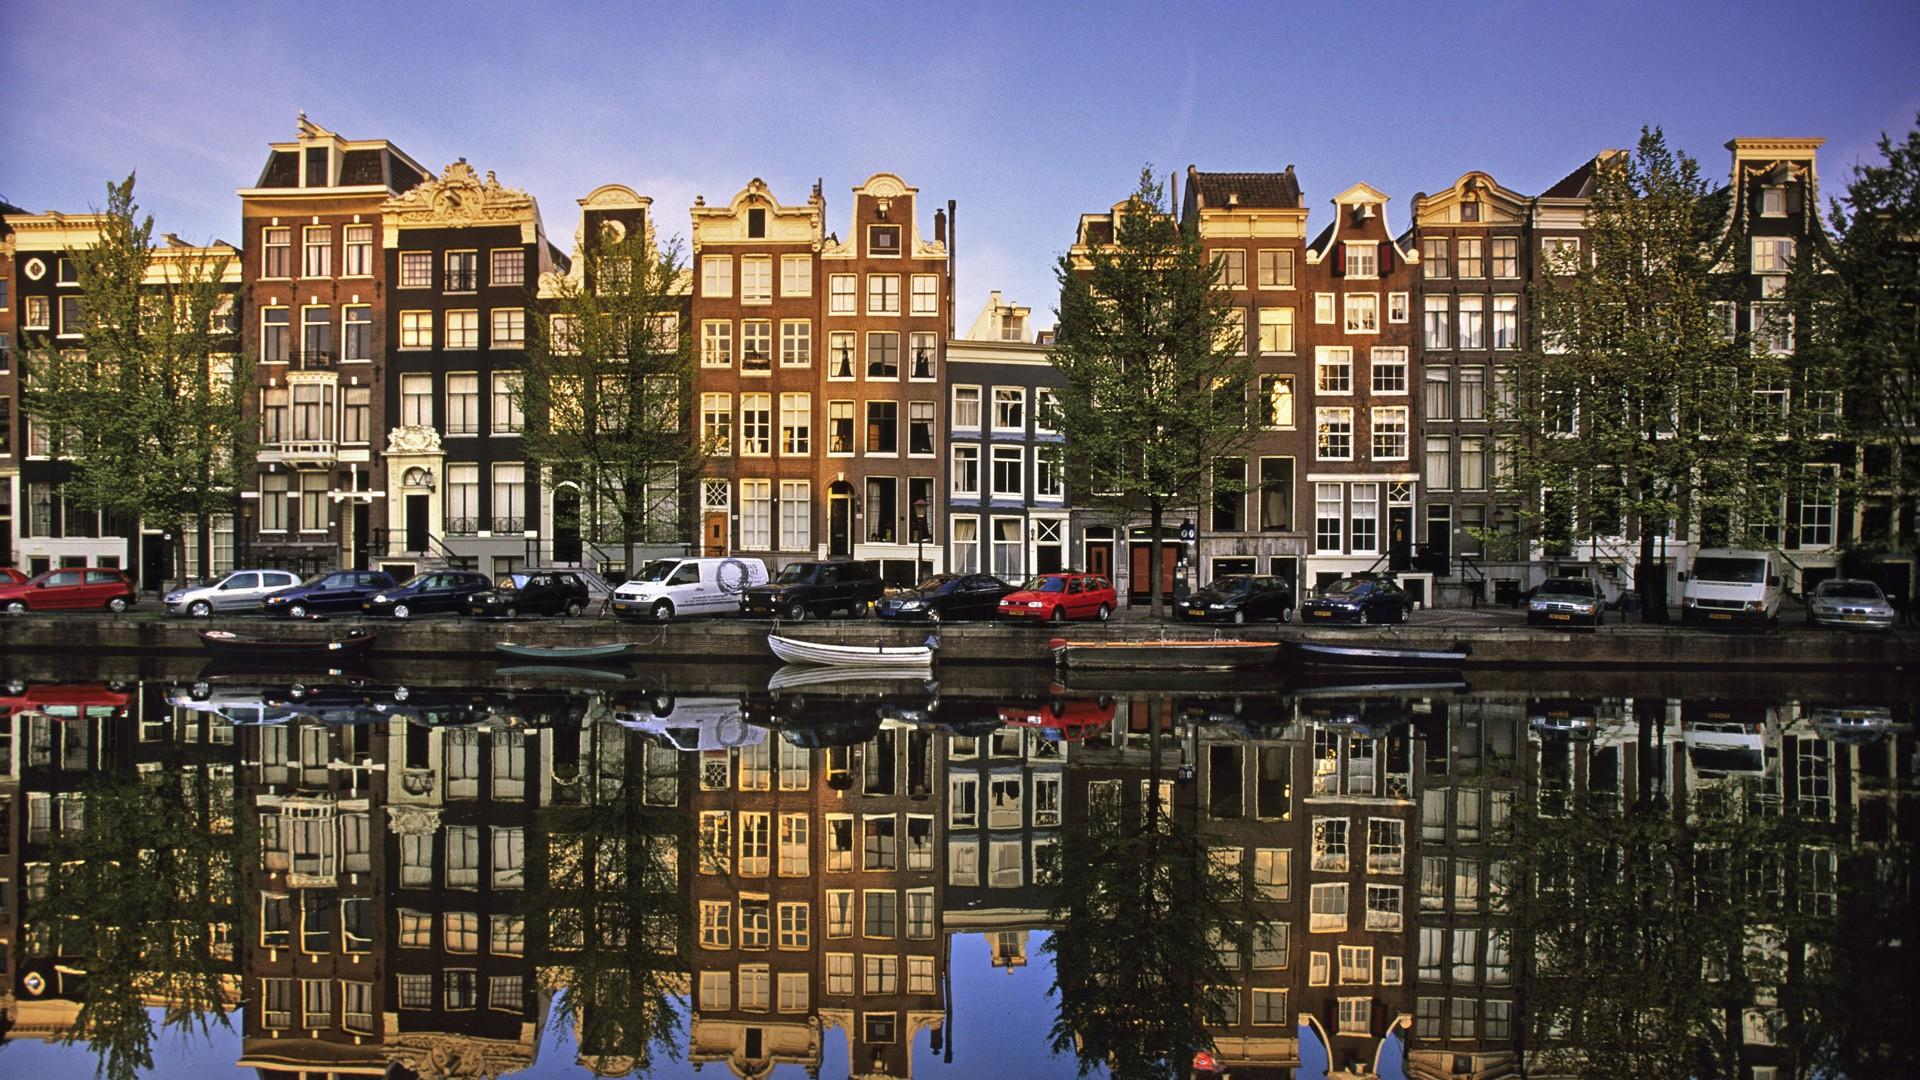 IFPA 2020 Amsterdam